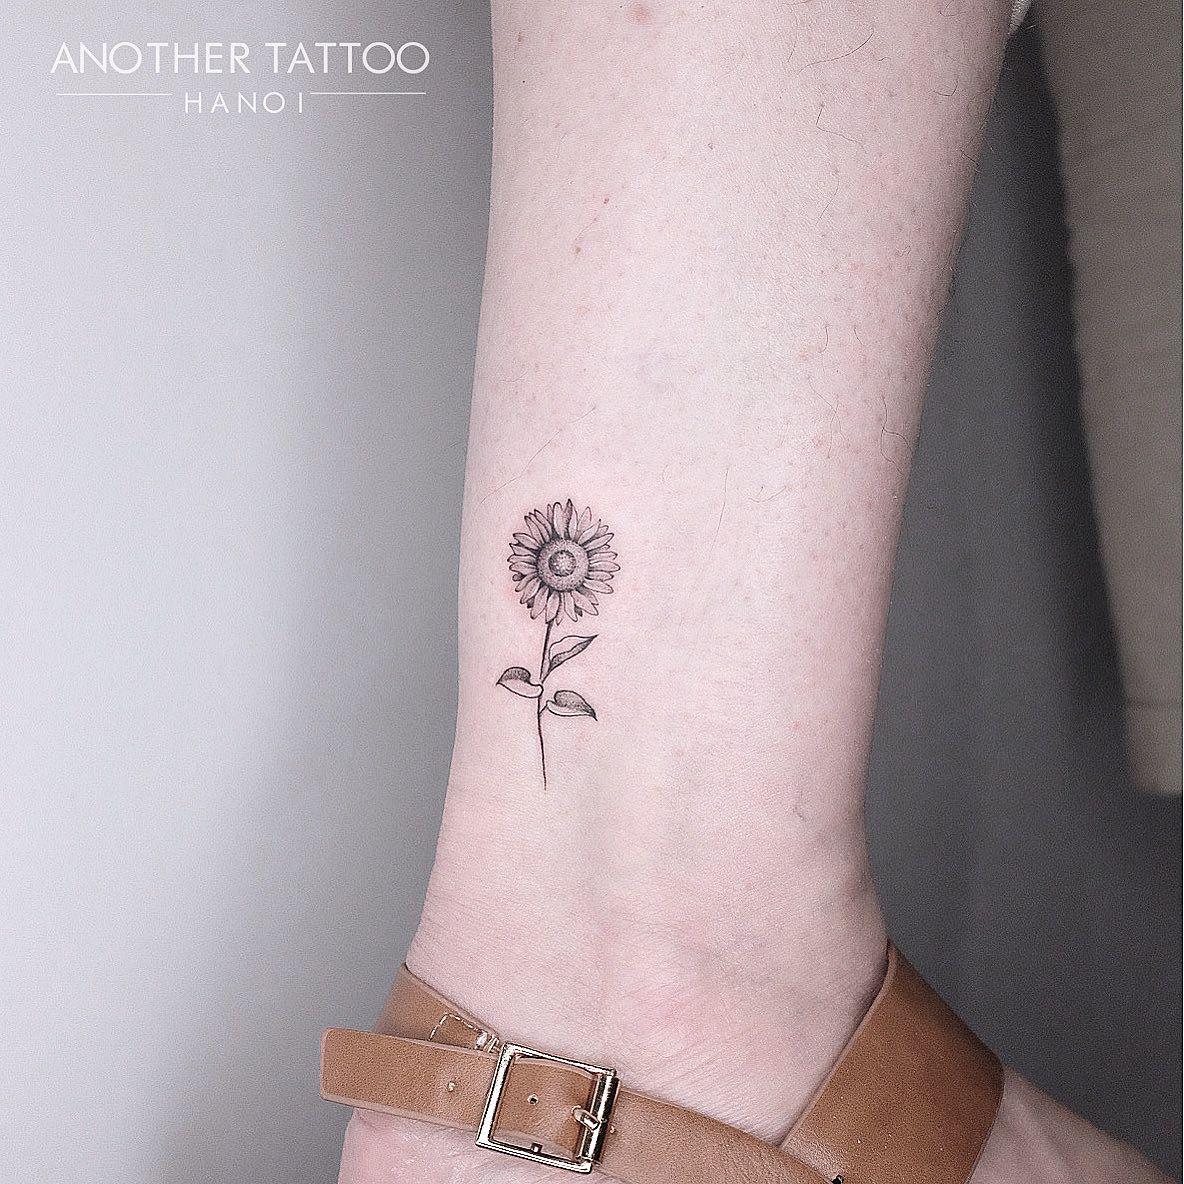 Photo of Tiny sunflower tattoo